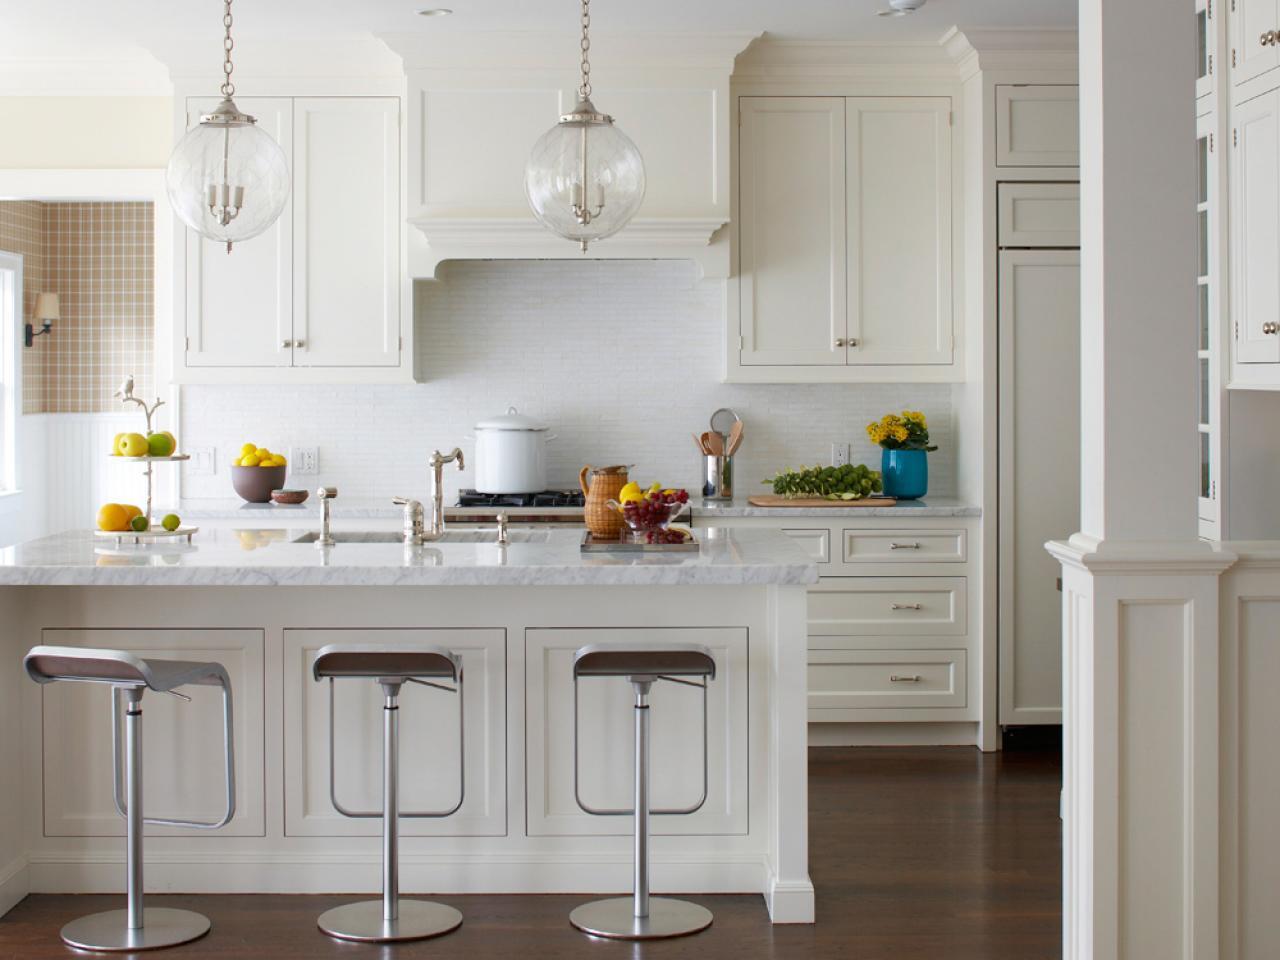 Best ideas about White Kitchen Ideas . Save or Pin Wonderful White Kitchens Jenna Burger Now.